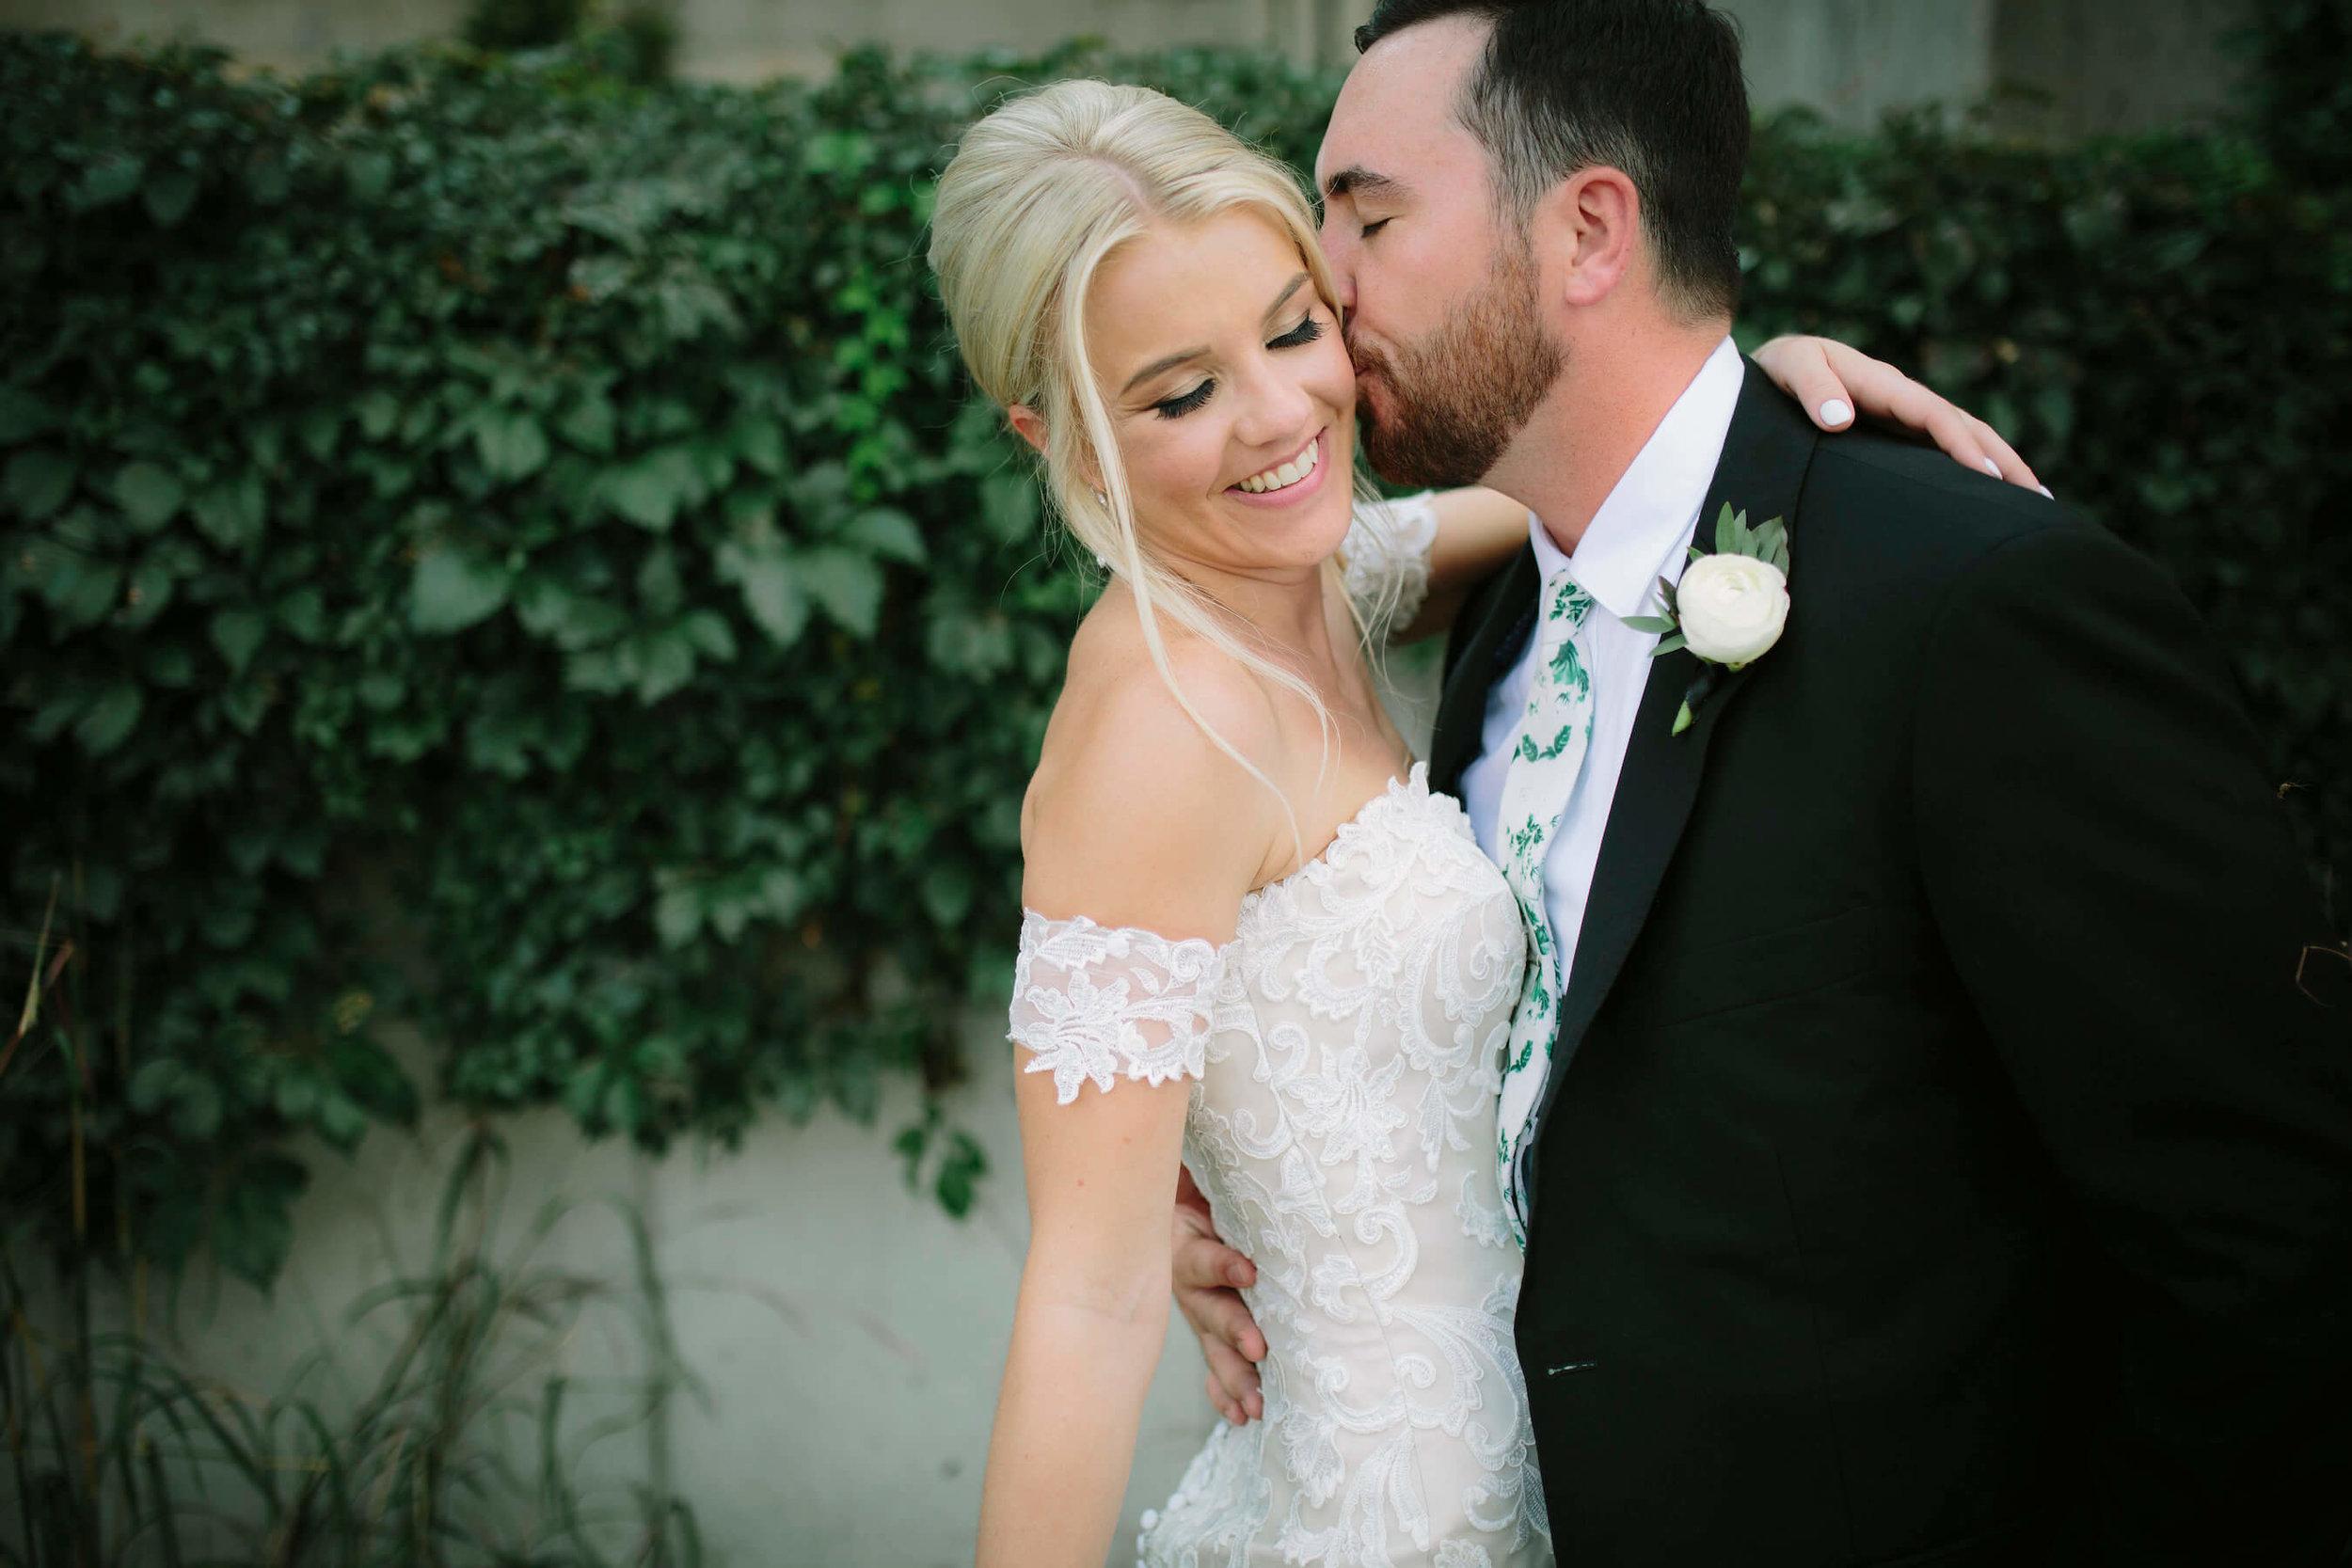 engle-olson-april-cj-wedding-jessica-holleque-5.jpg